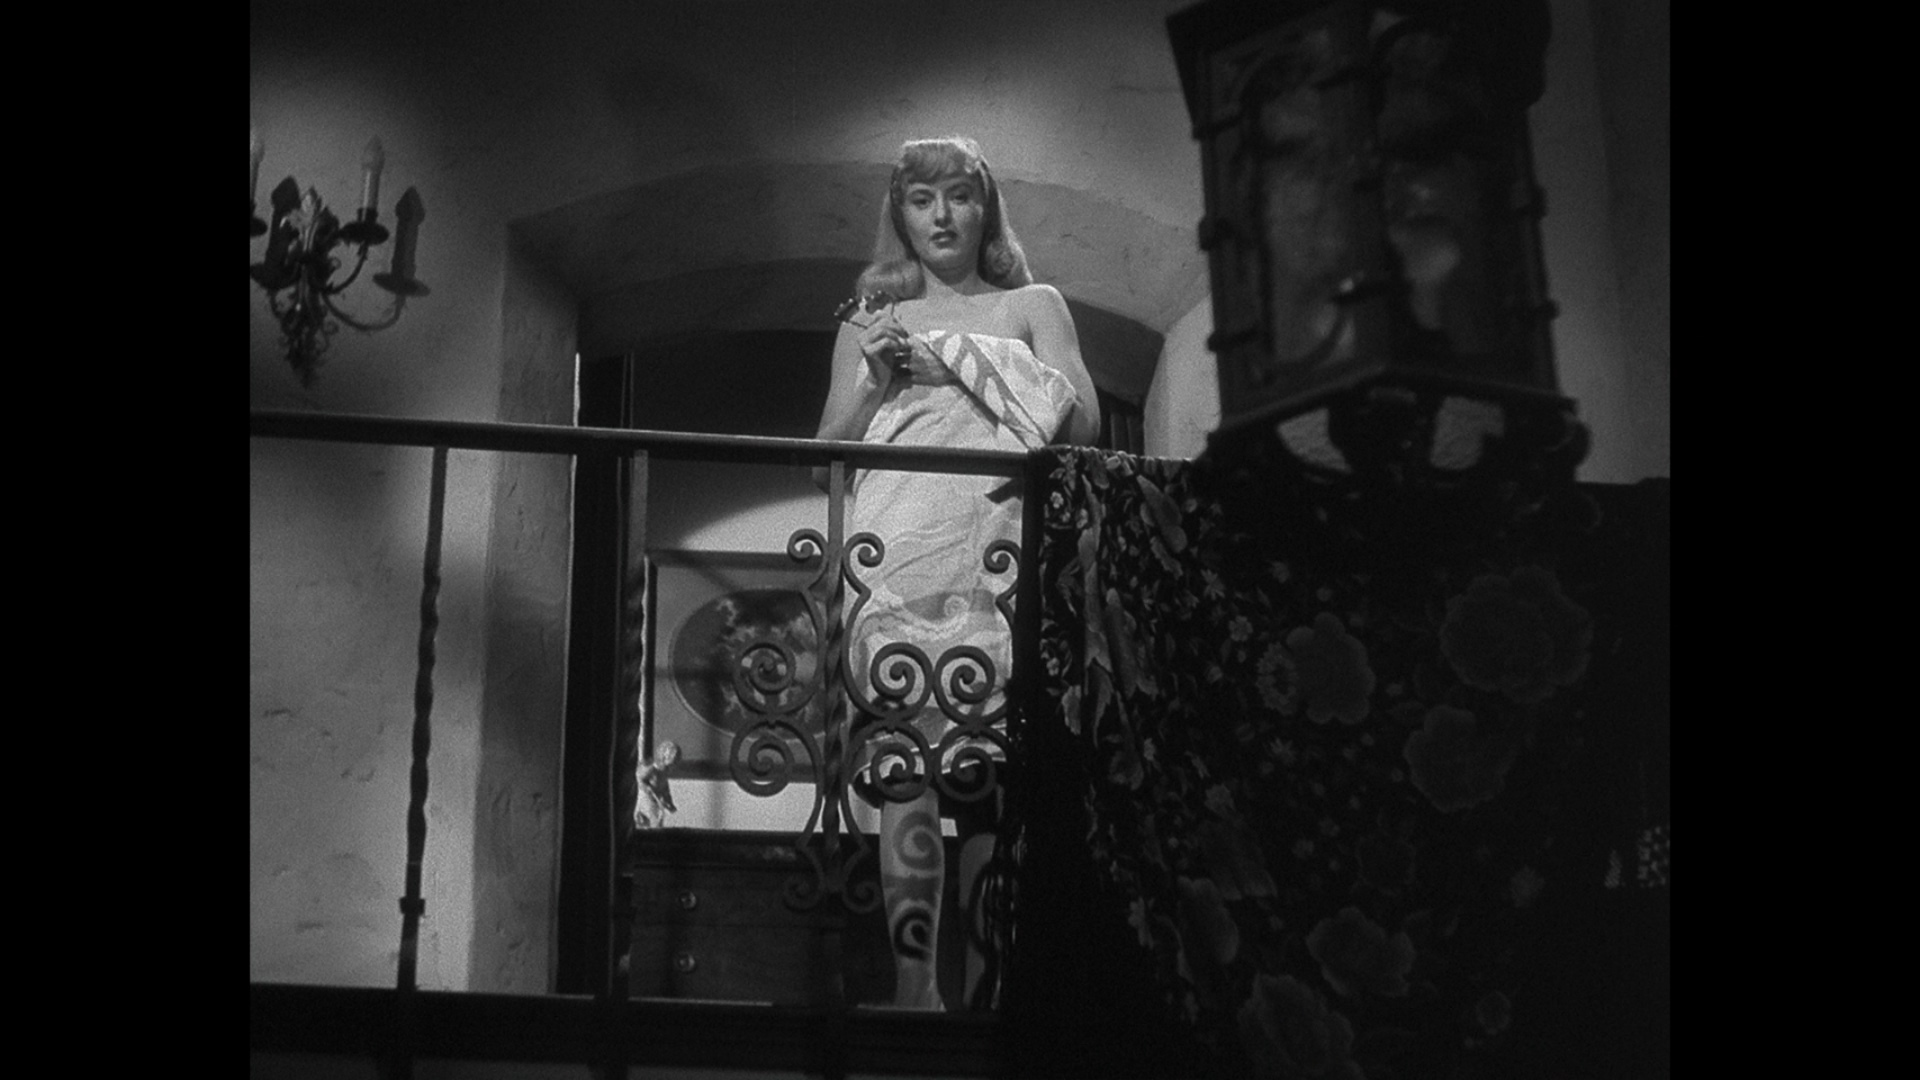 film noir genre essay drureport web fc com film noir genre essay